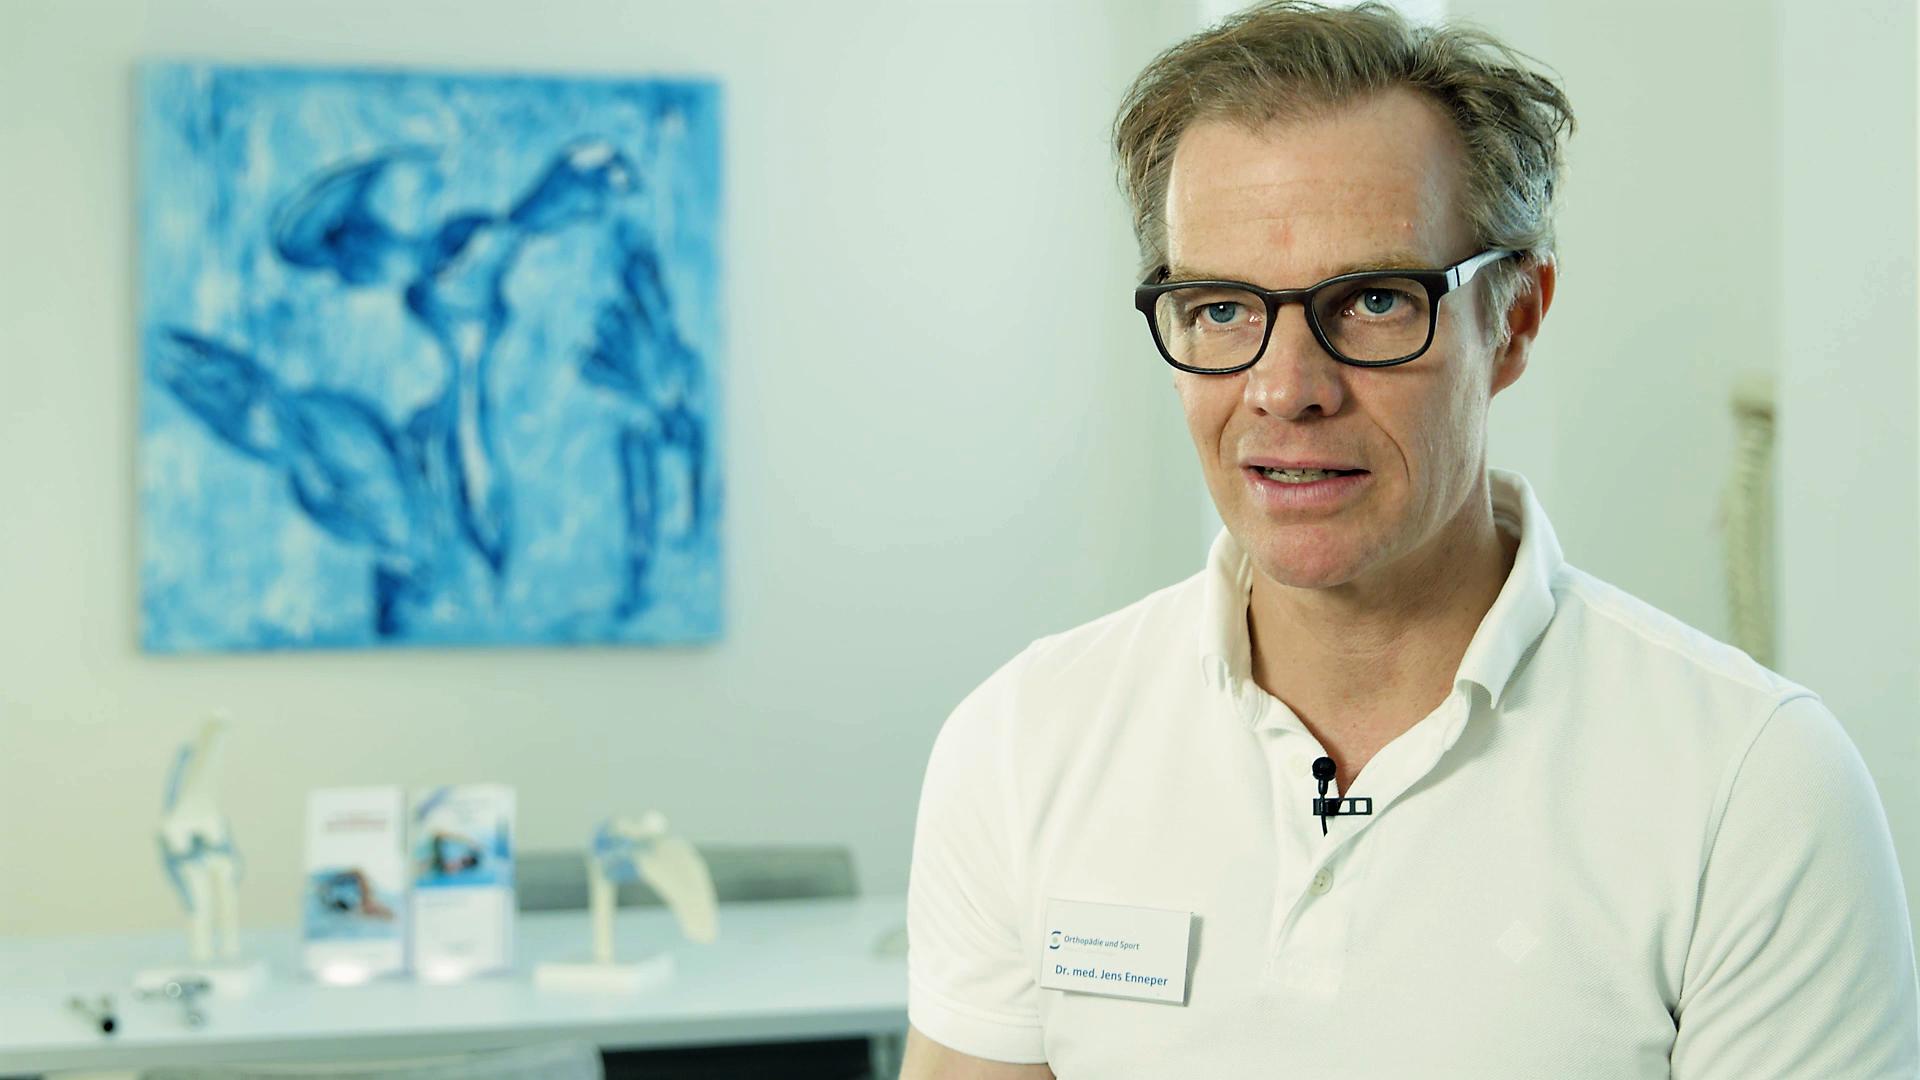 Dr. Jens Enneper im Interview zur ACP-Therapie